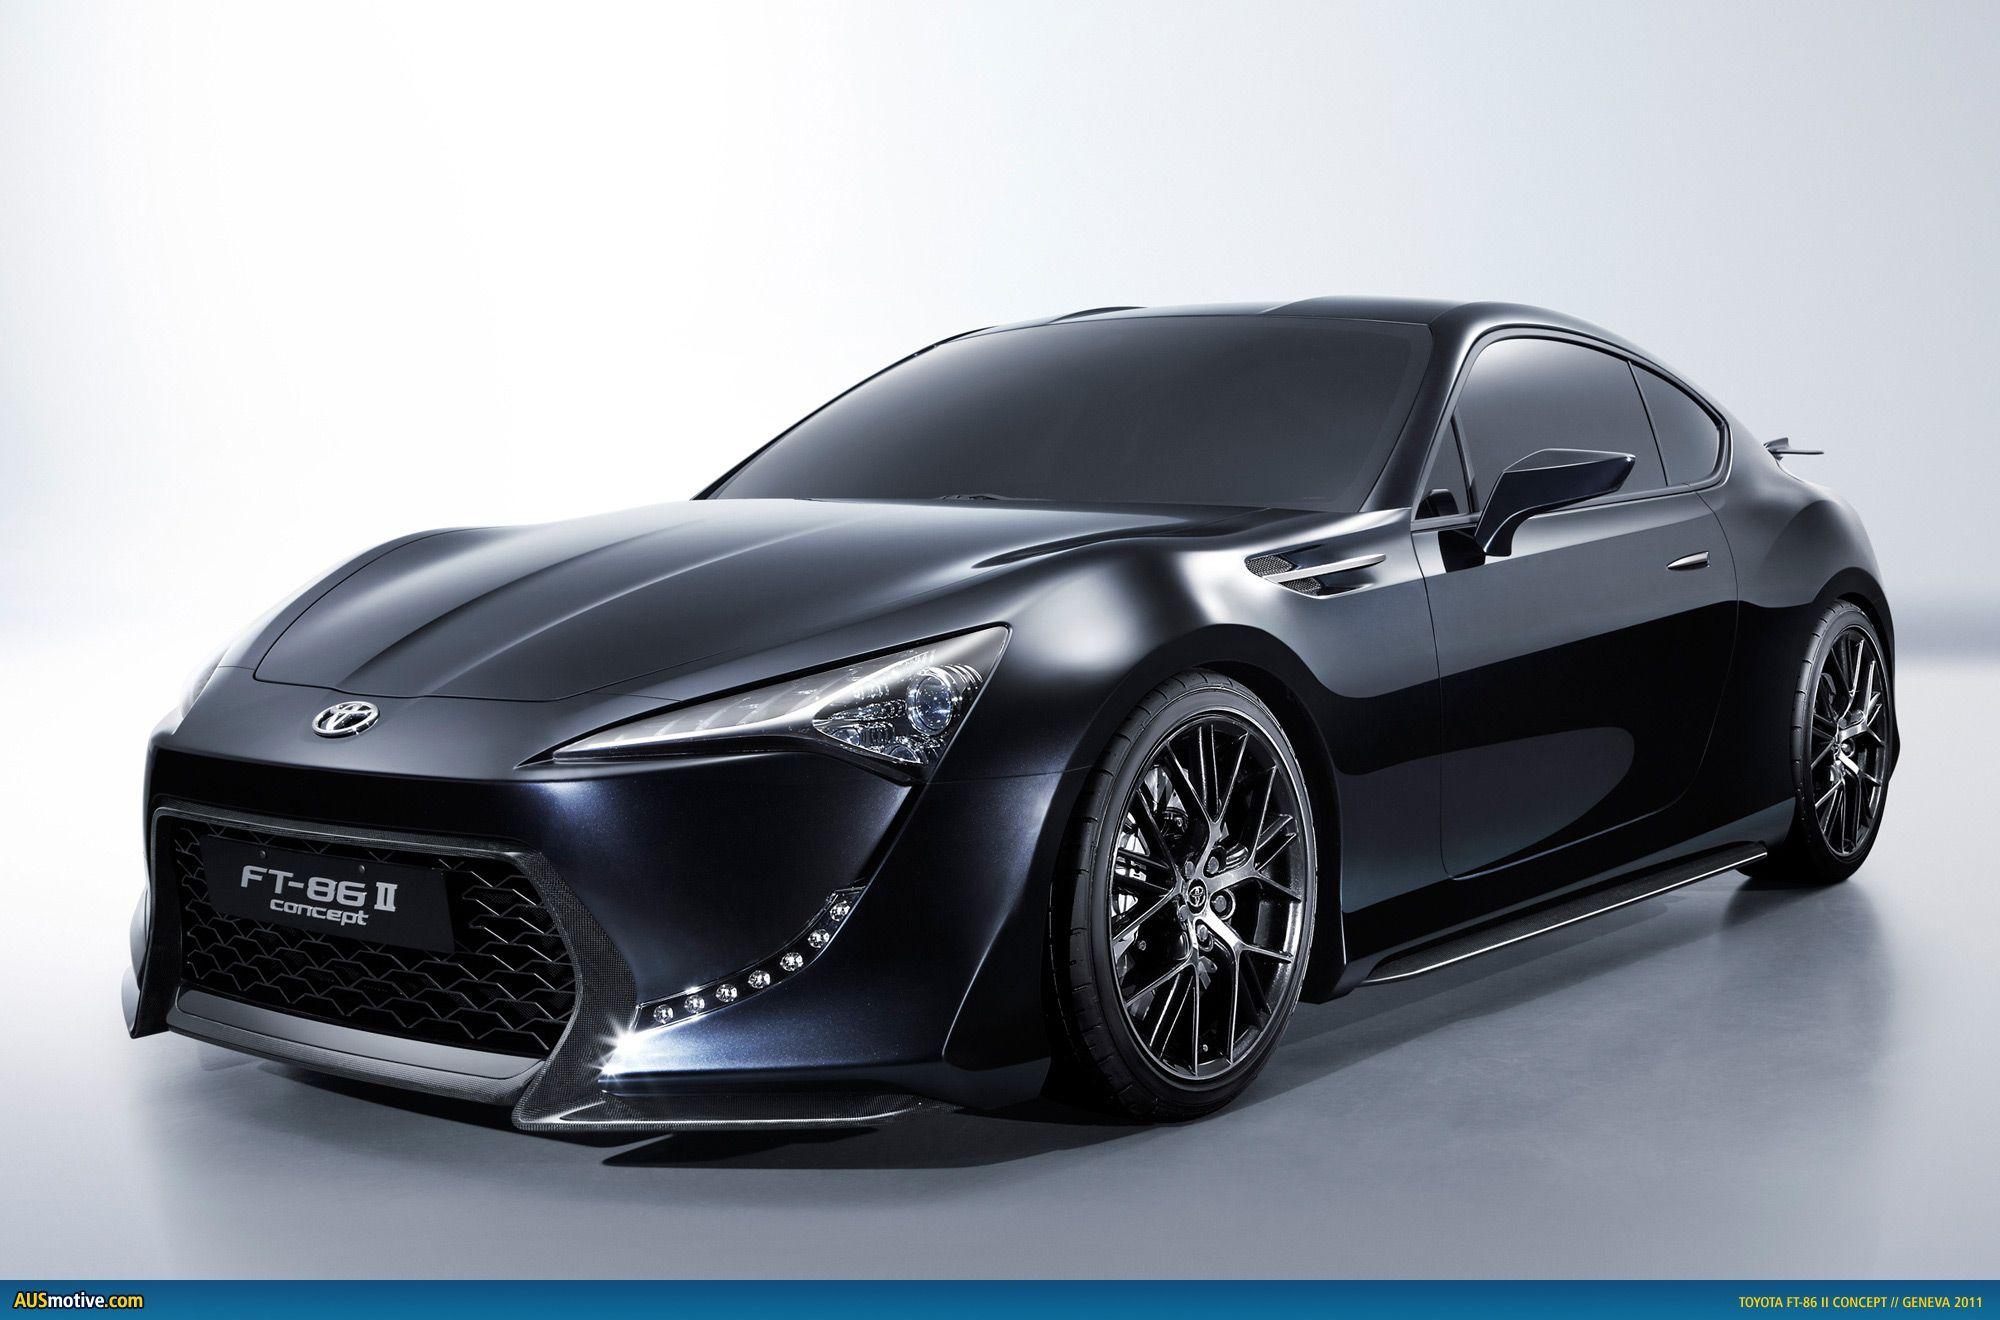 30,000 Toyota sports car for 2012 Sports car, Toyota